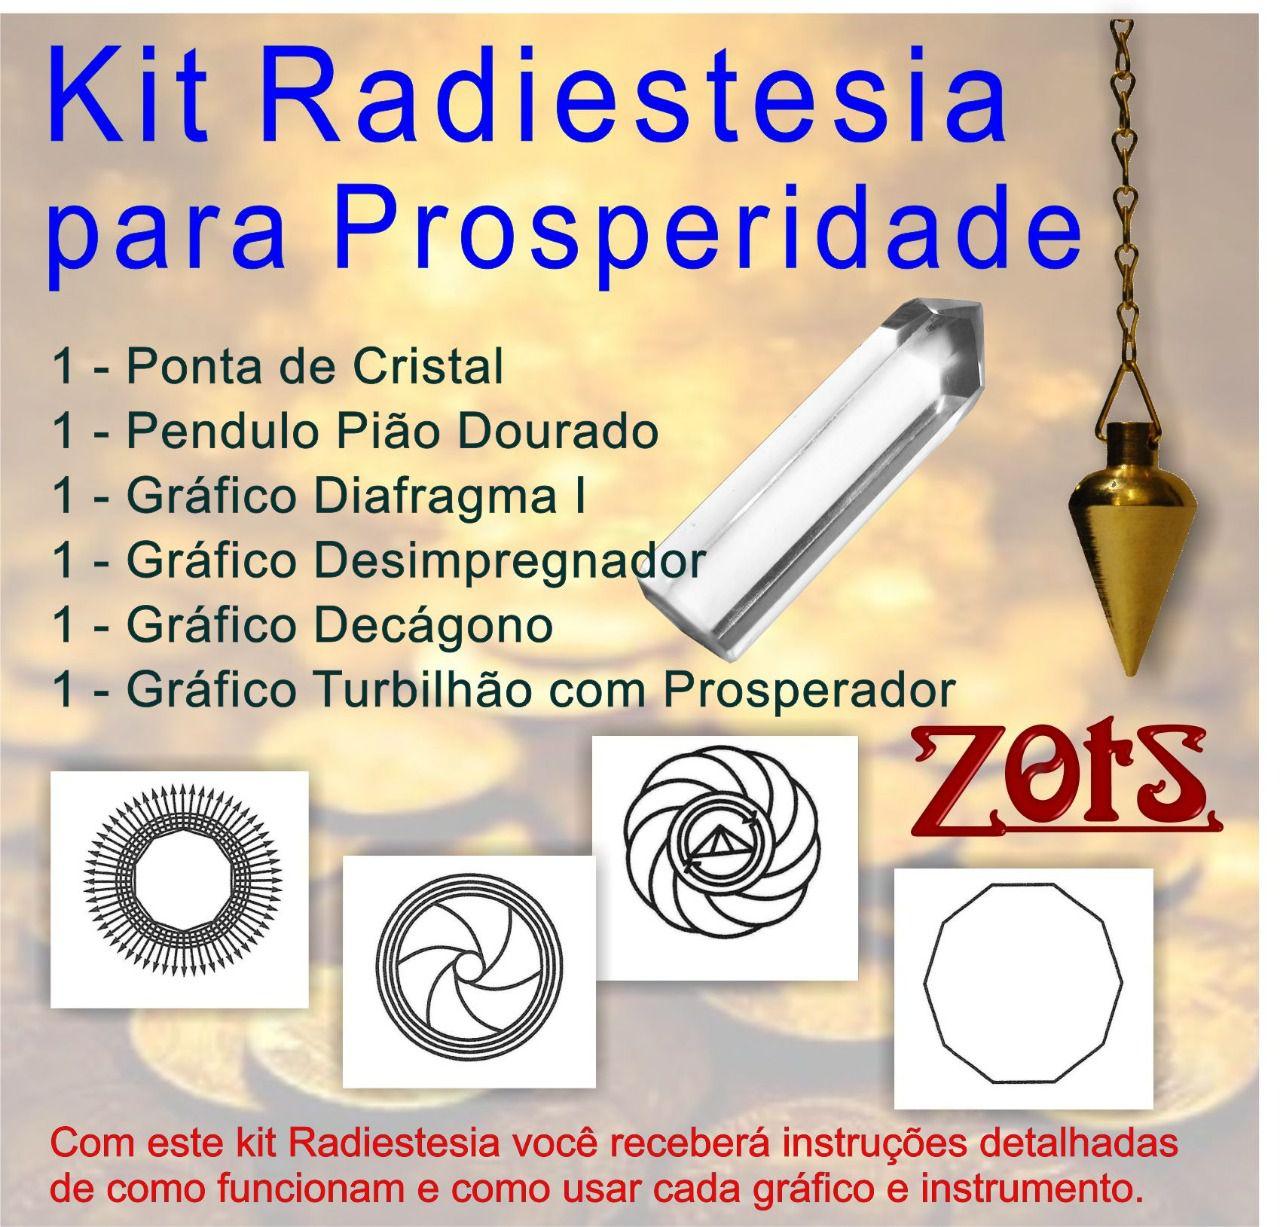 Kit Radiestesia Prosperidade